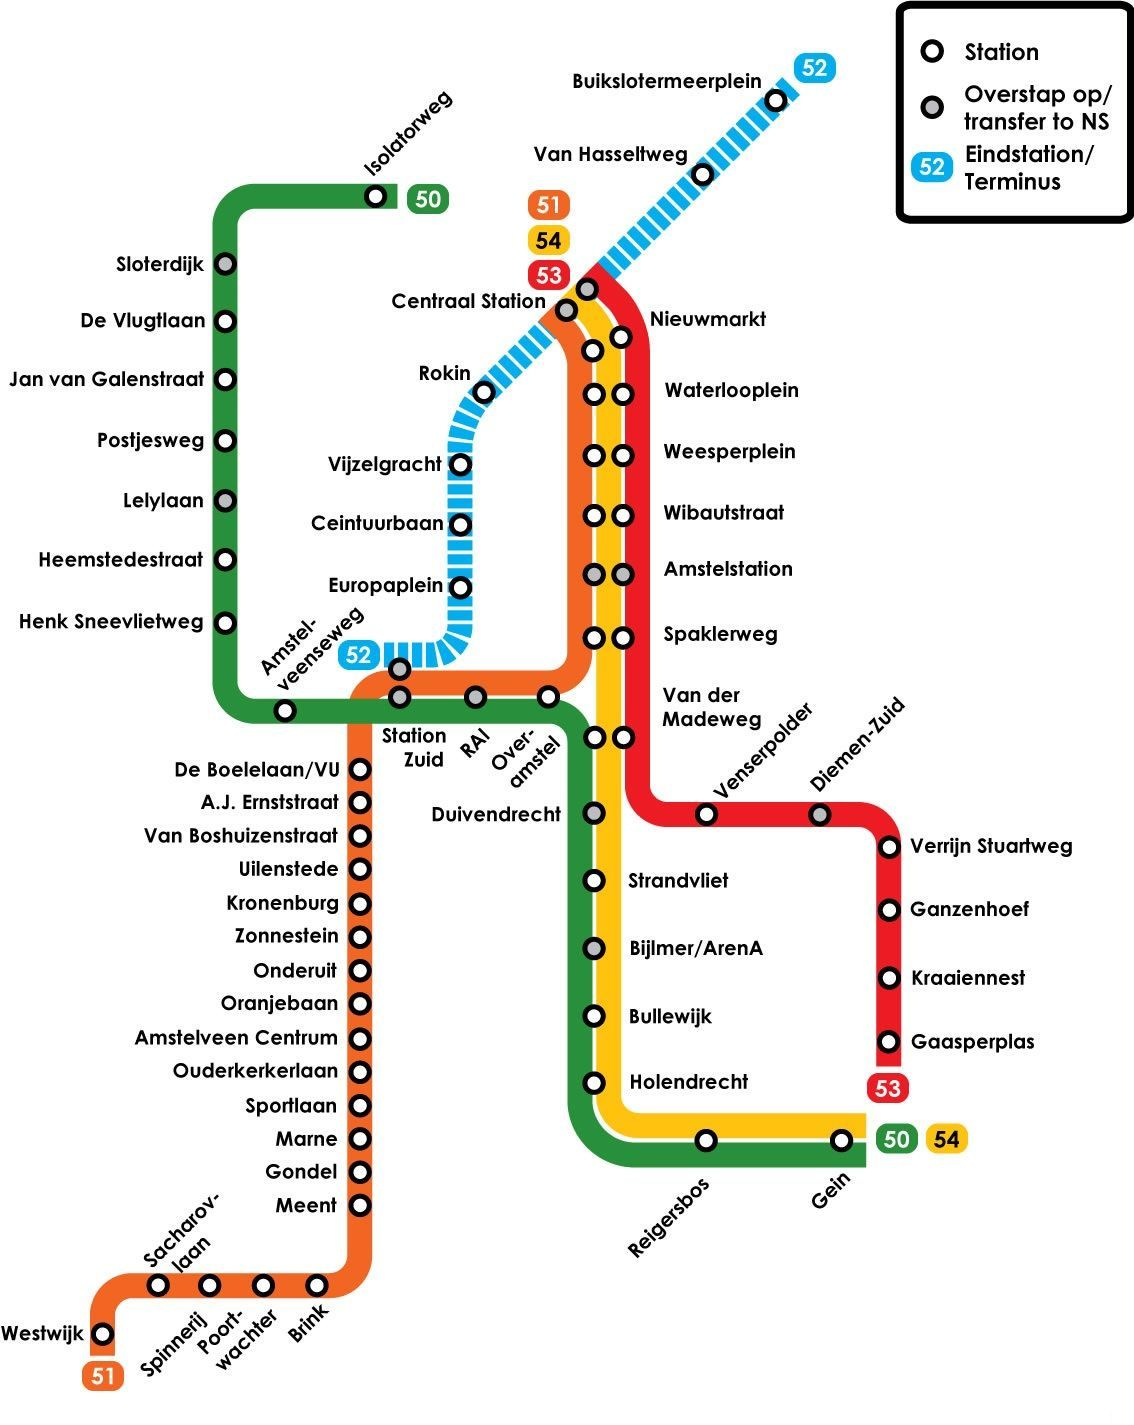 Subway Map Of Amsterdam.Amsterdam Subway Map Metro In 2019 Train Map Subway Map